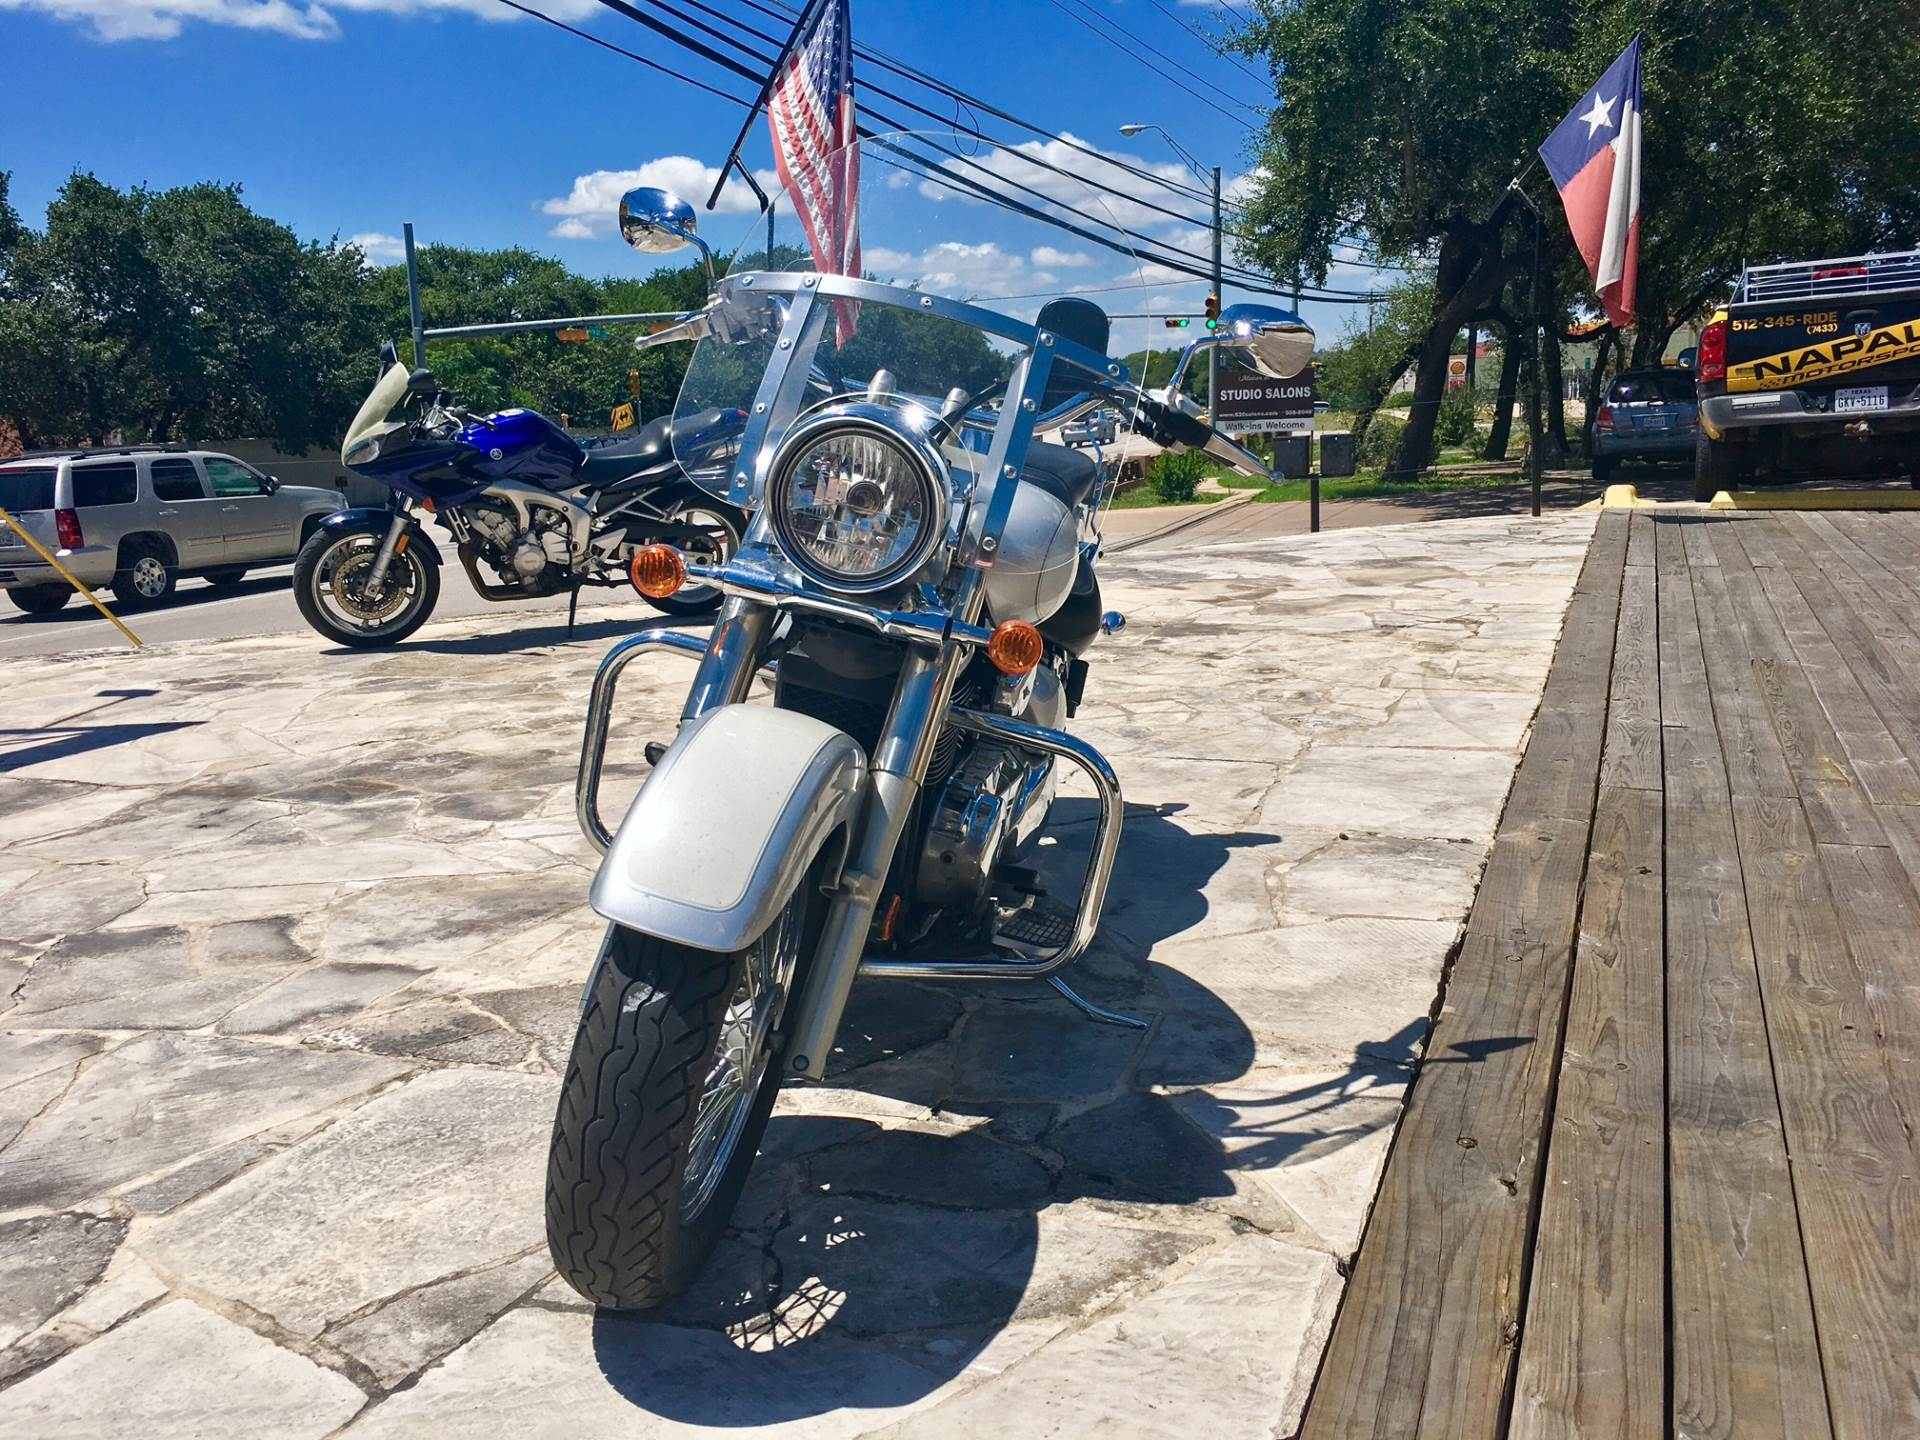 2007 Suzuki Boulevard C50 in Austin, Texas